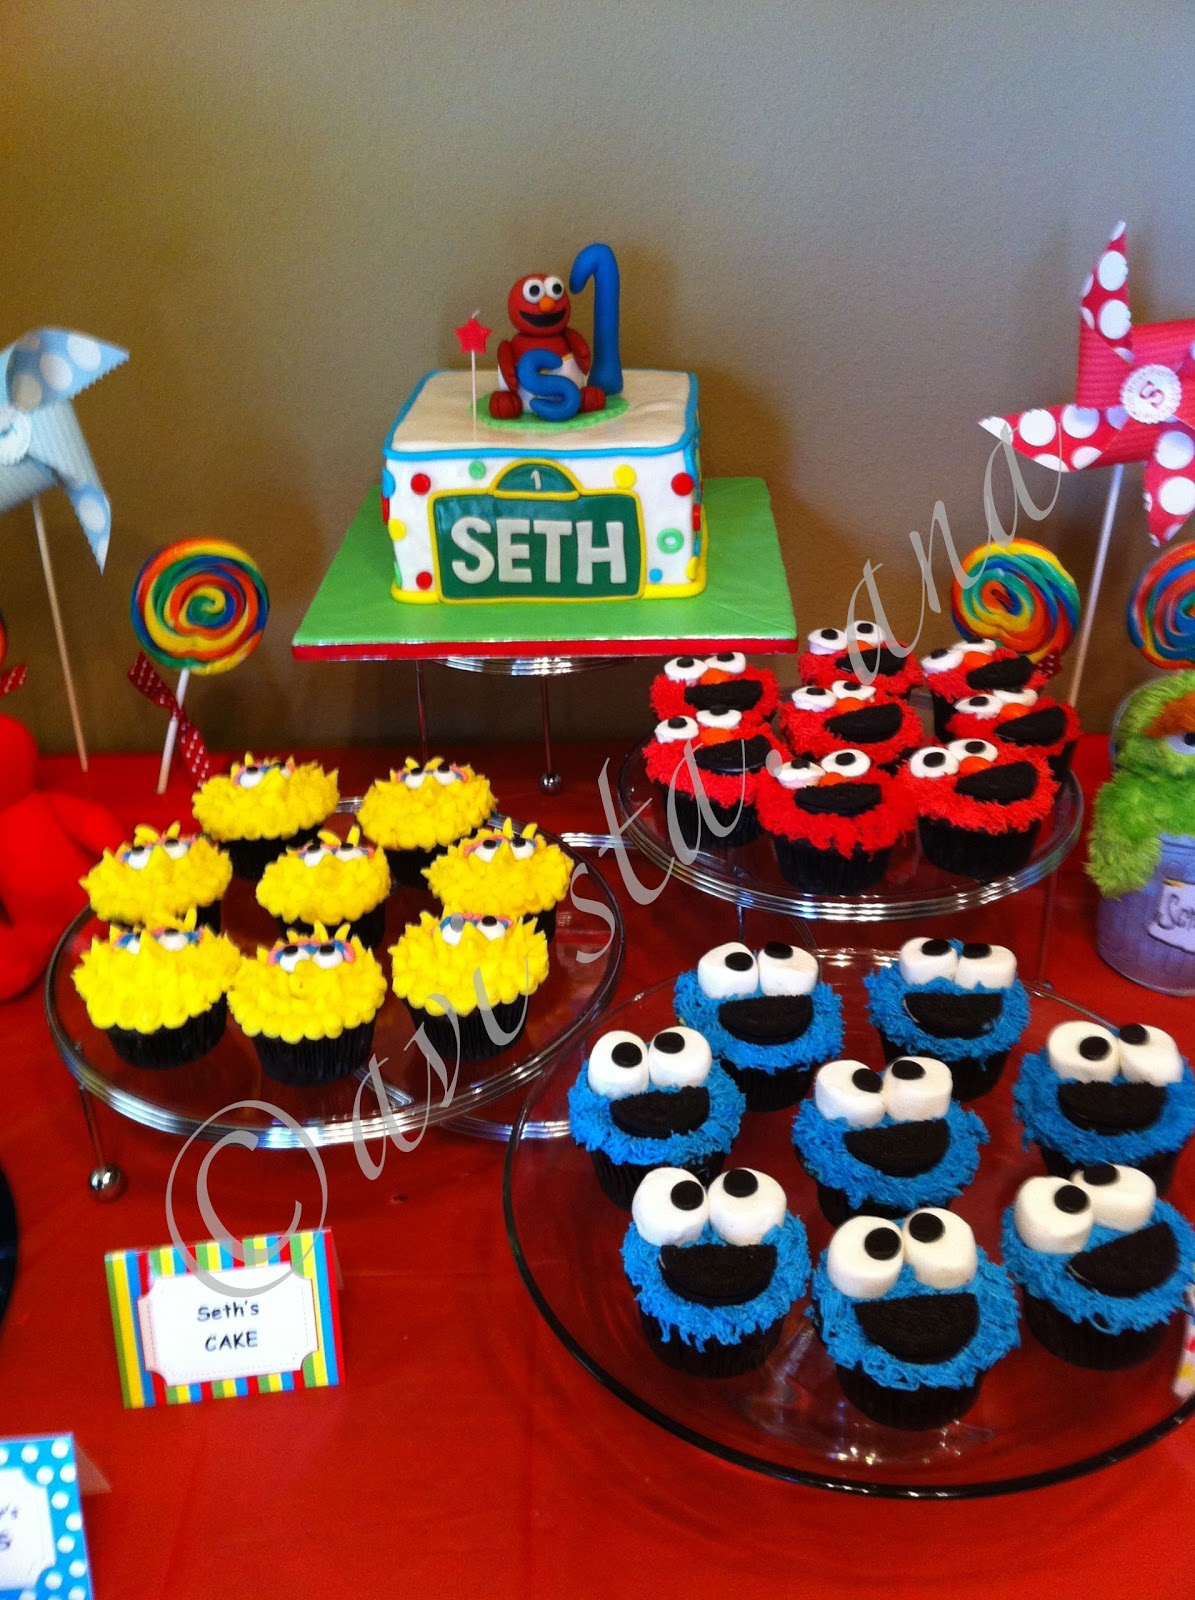 Cake Decorating Sesame Street Birthday : A Lot of Sugar: Sesame Street Cake